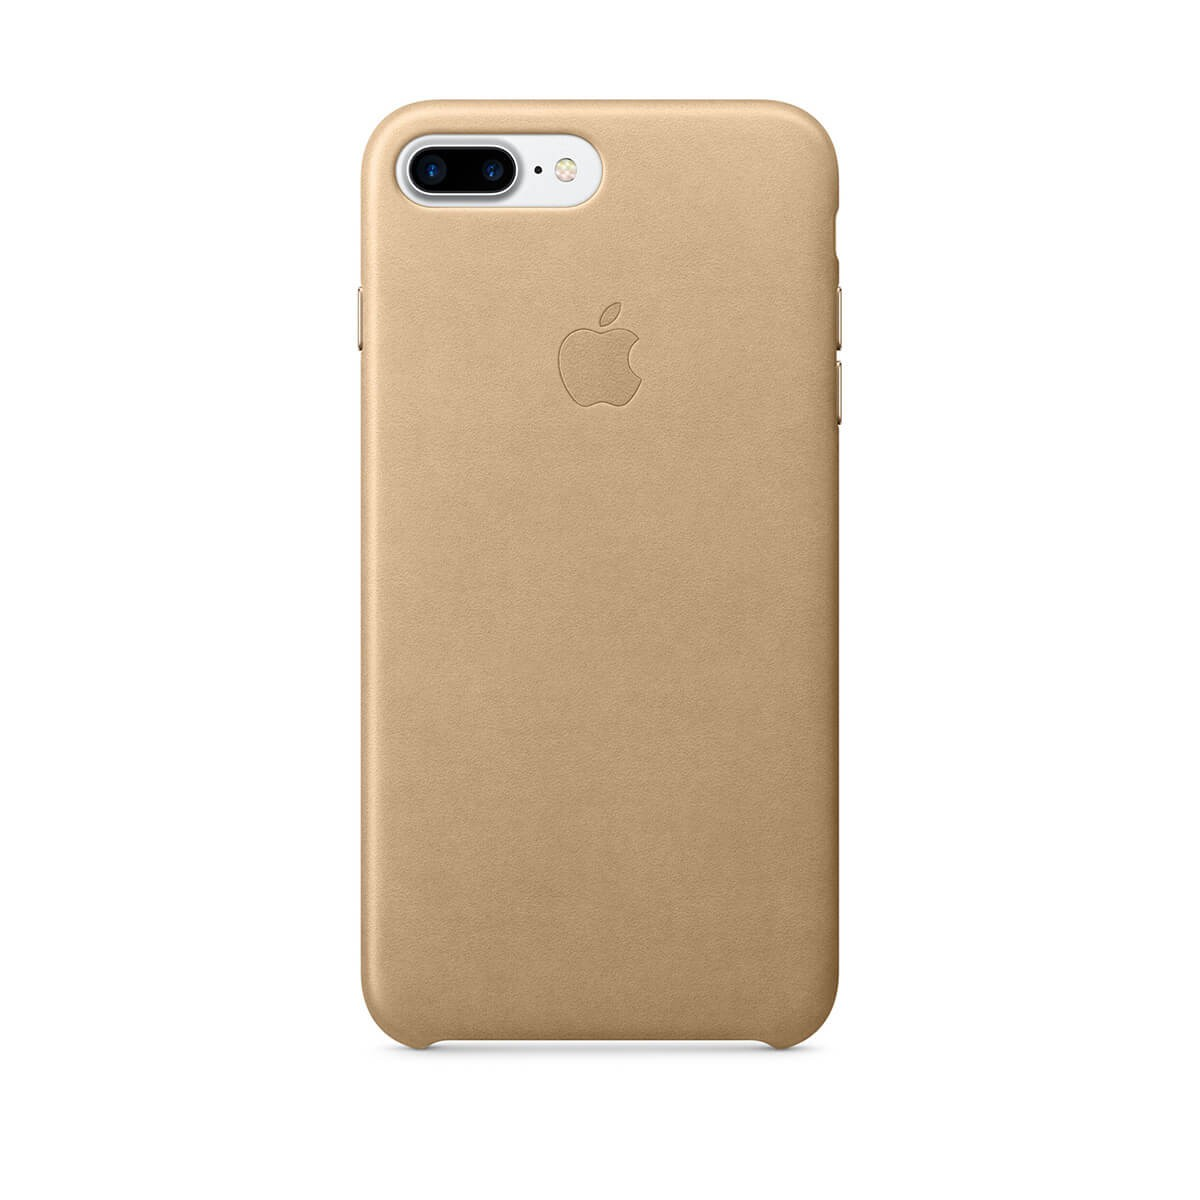 Apple kožený kryt na iPhone 7 Plus – žlutohnědý